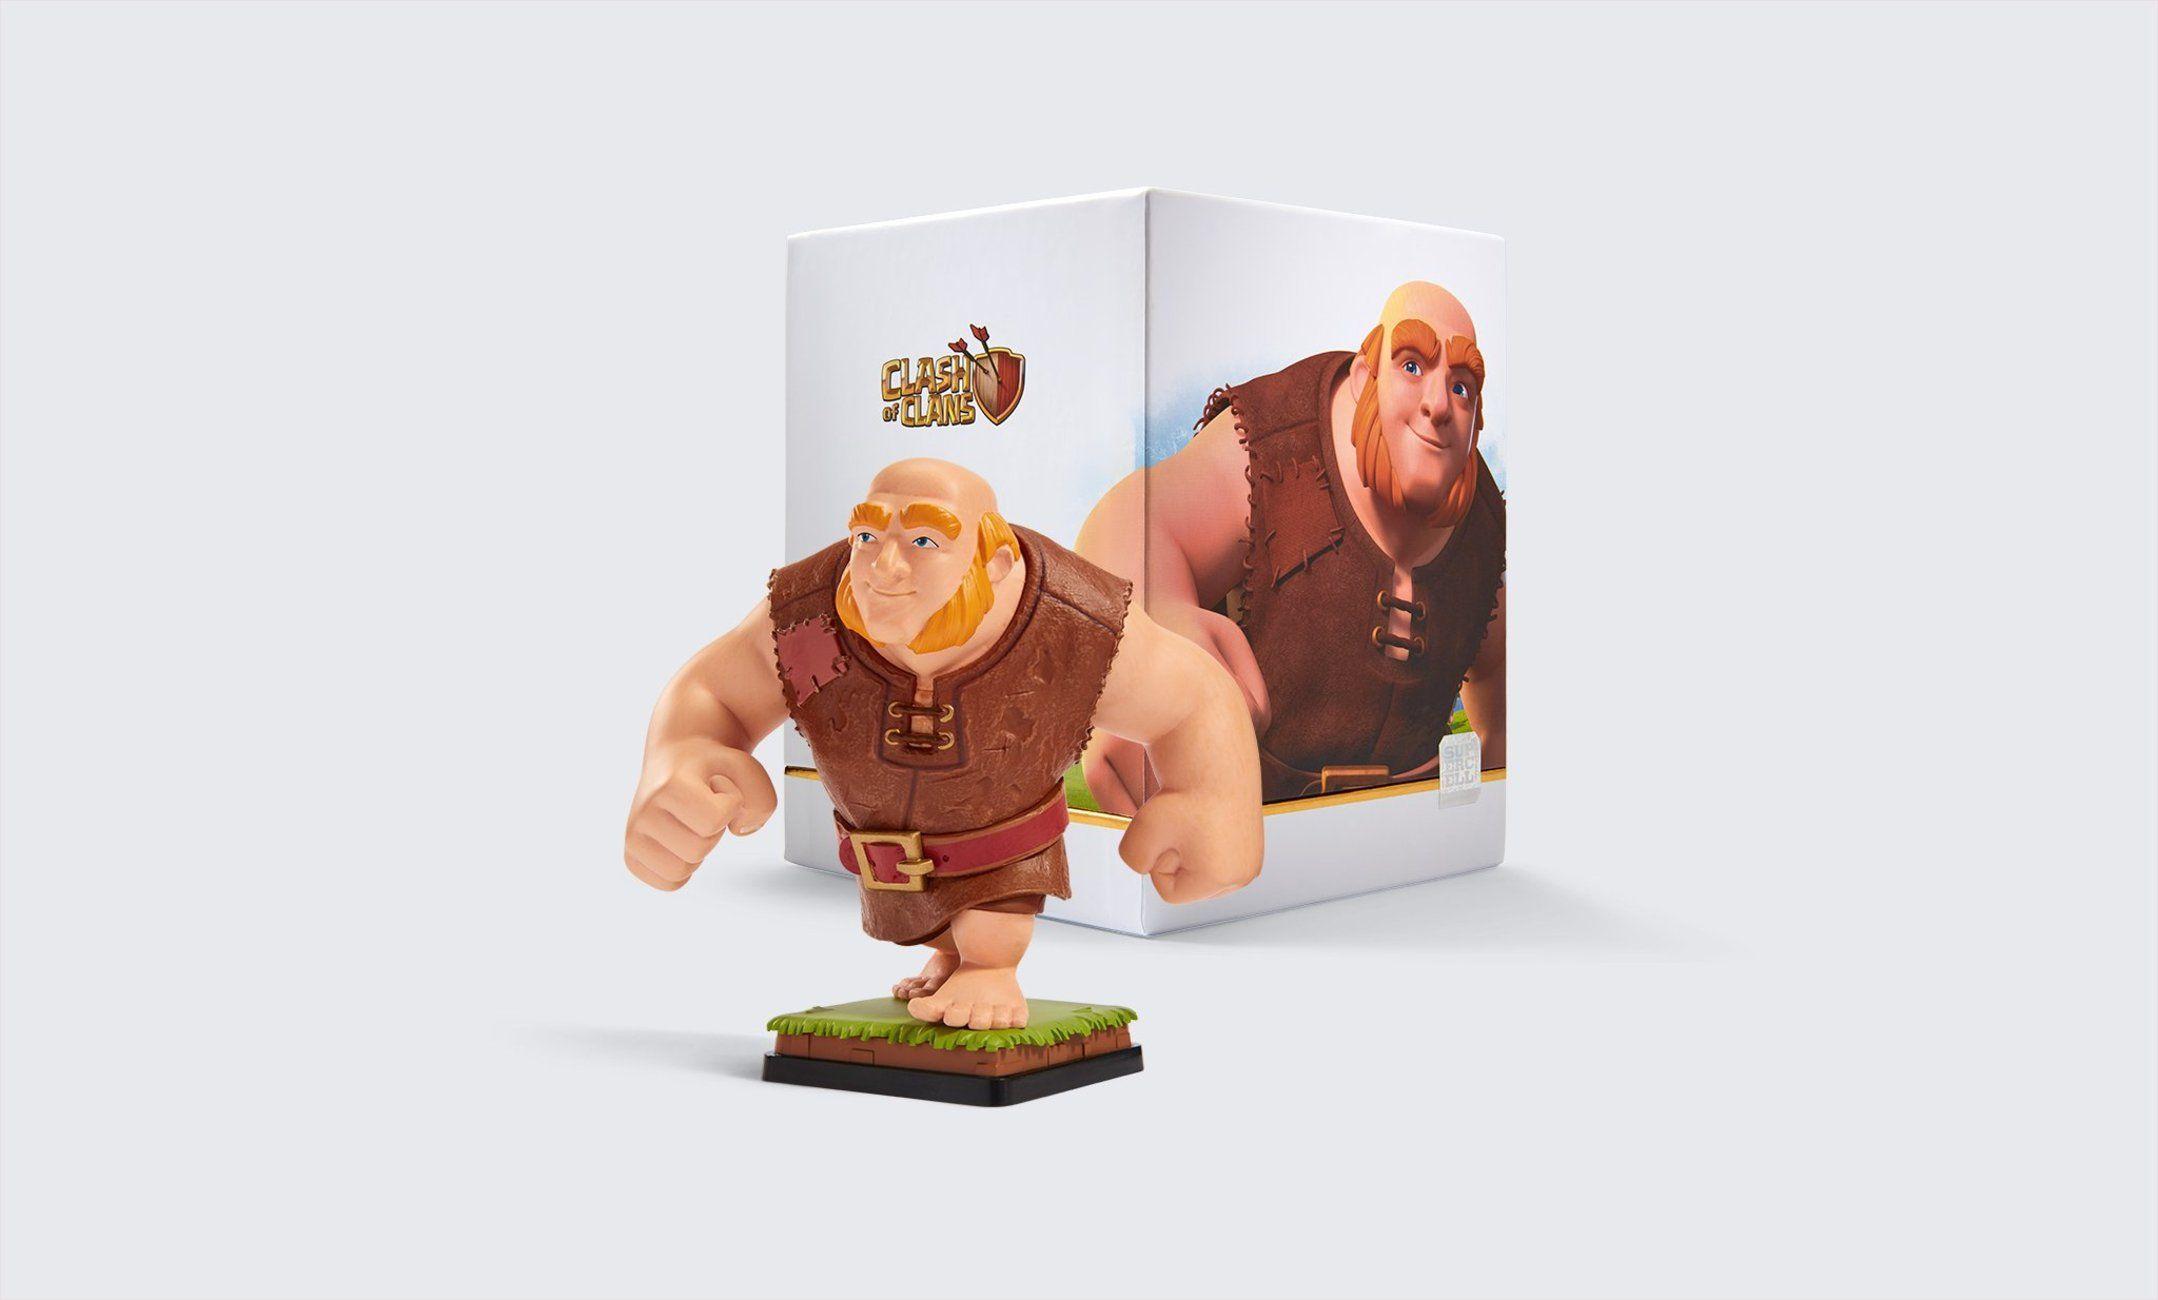 Clash Royale Merchandise Amazon